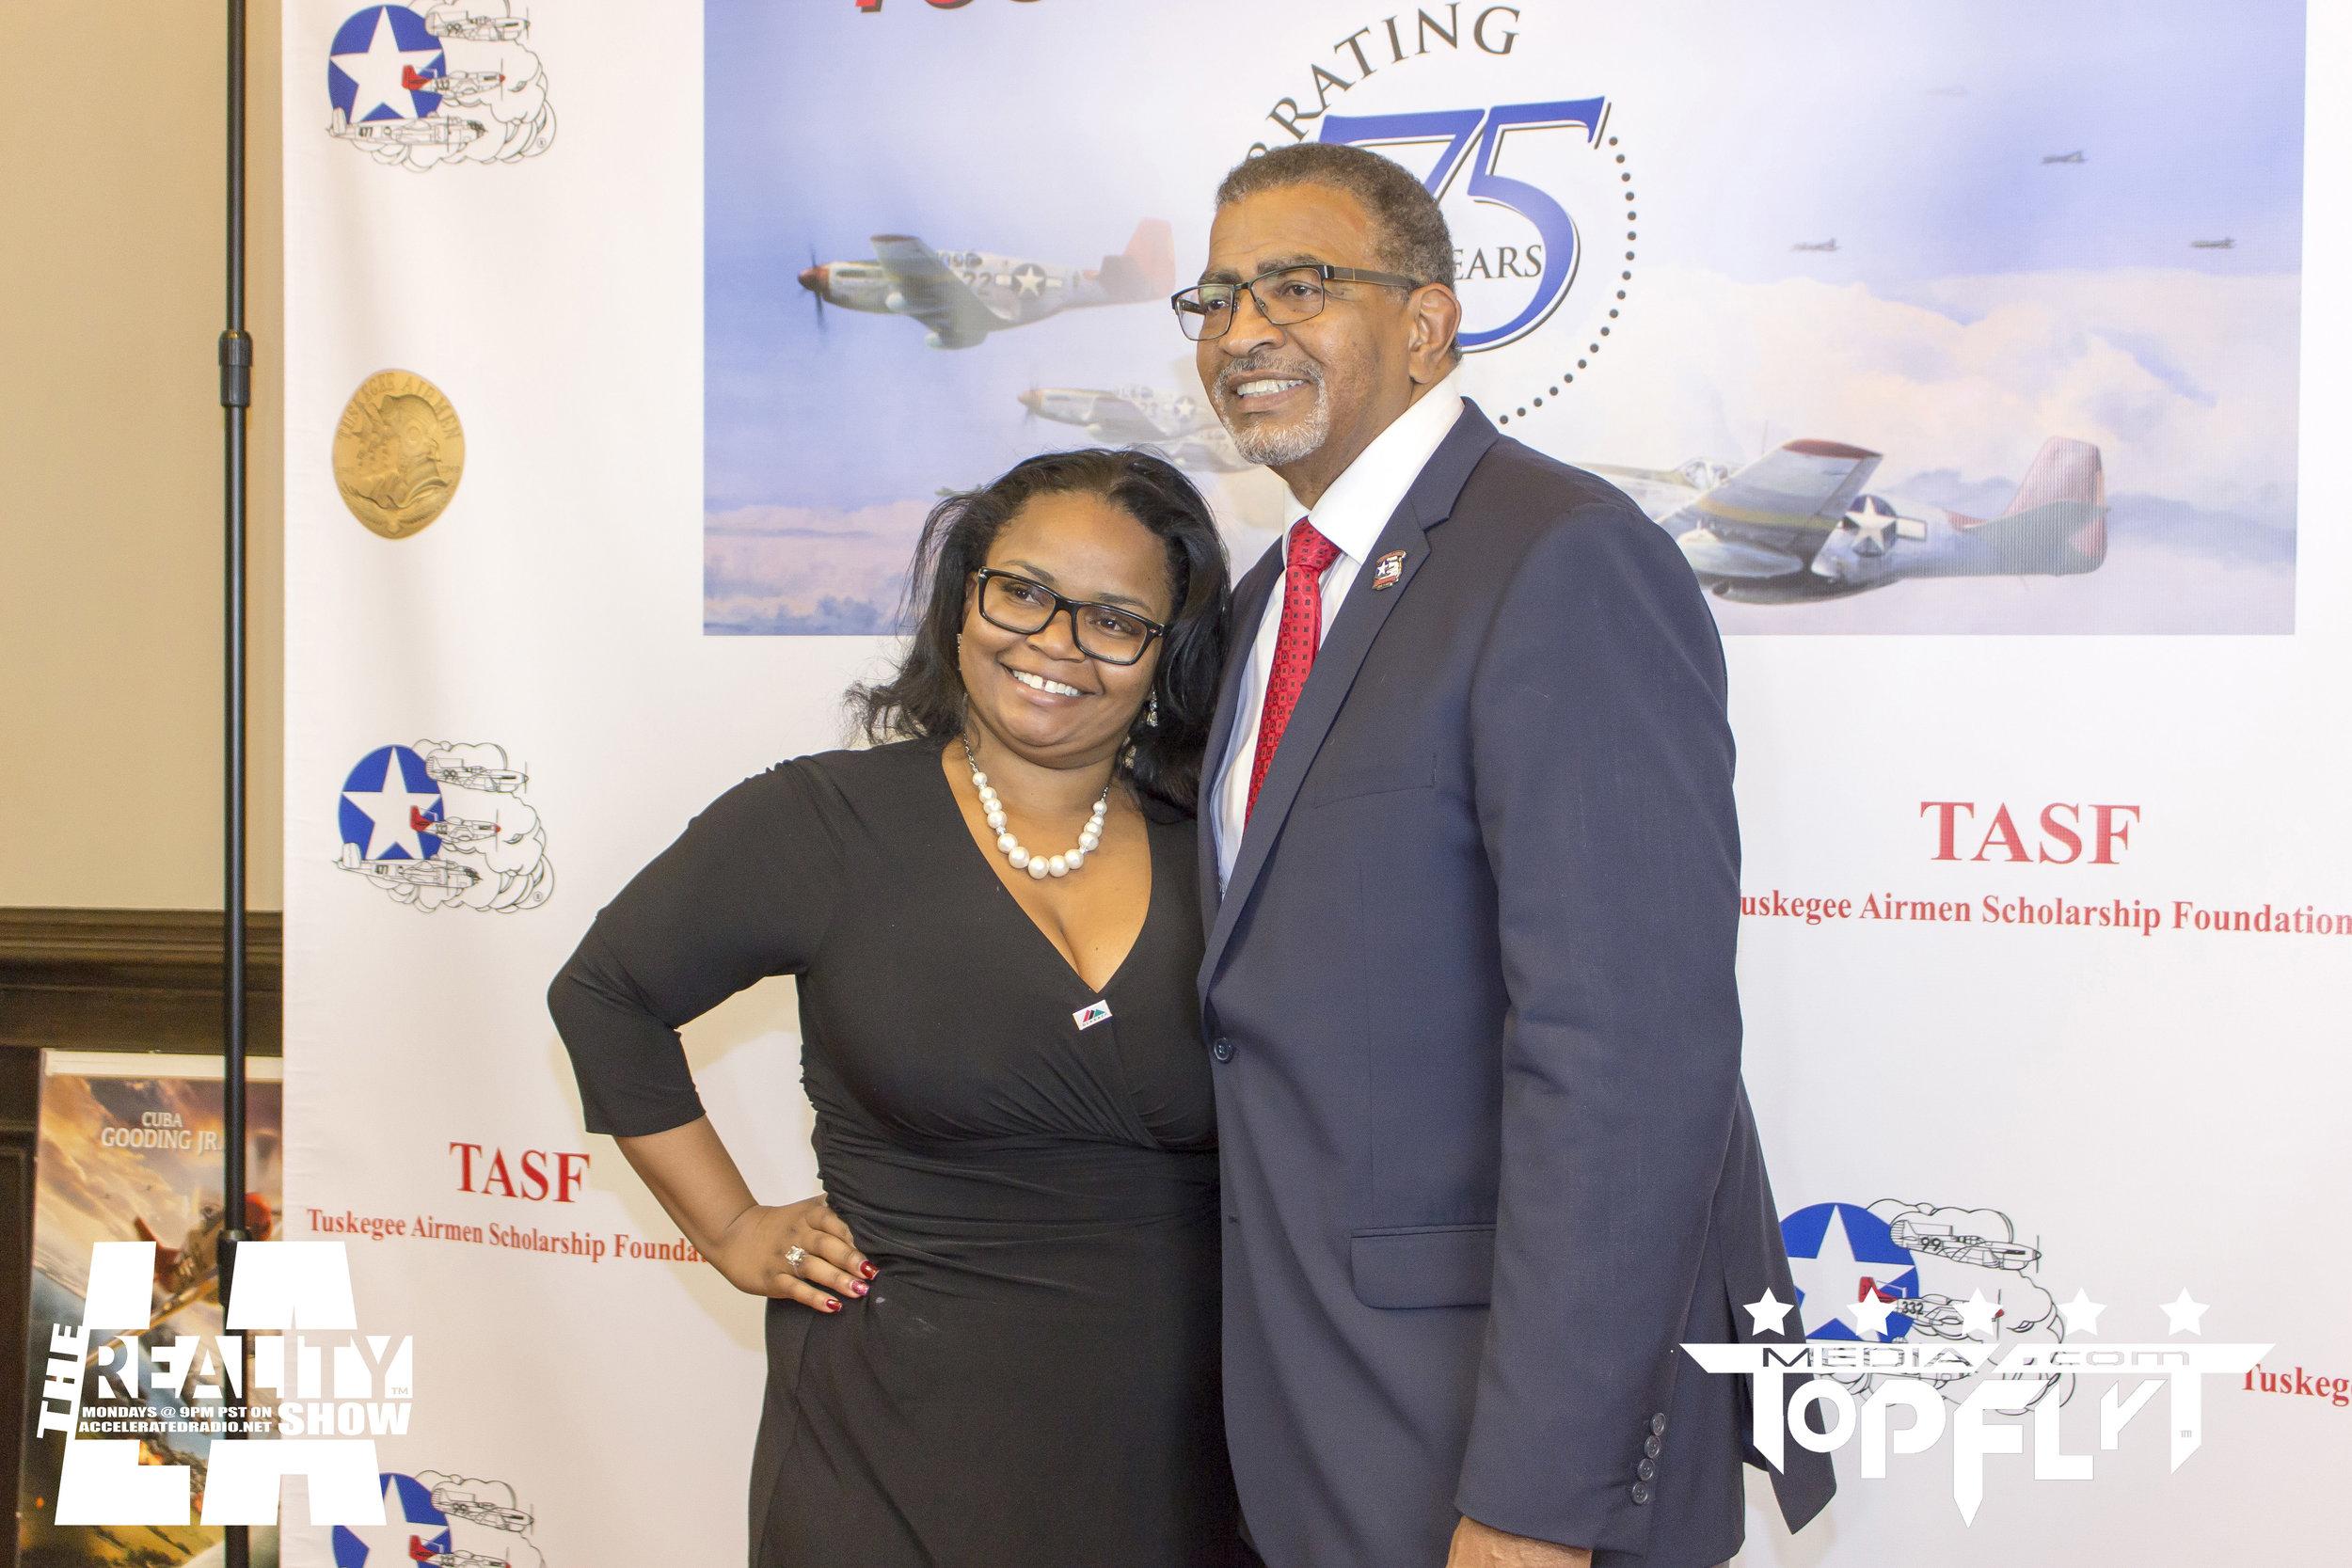 The Reality Show LA - Tuskegee Airmen 75th Anniversary VIP Reception_109.jpg